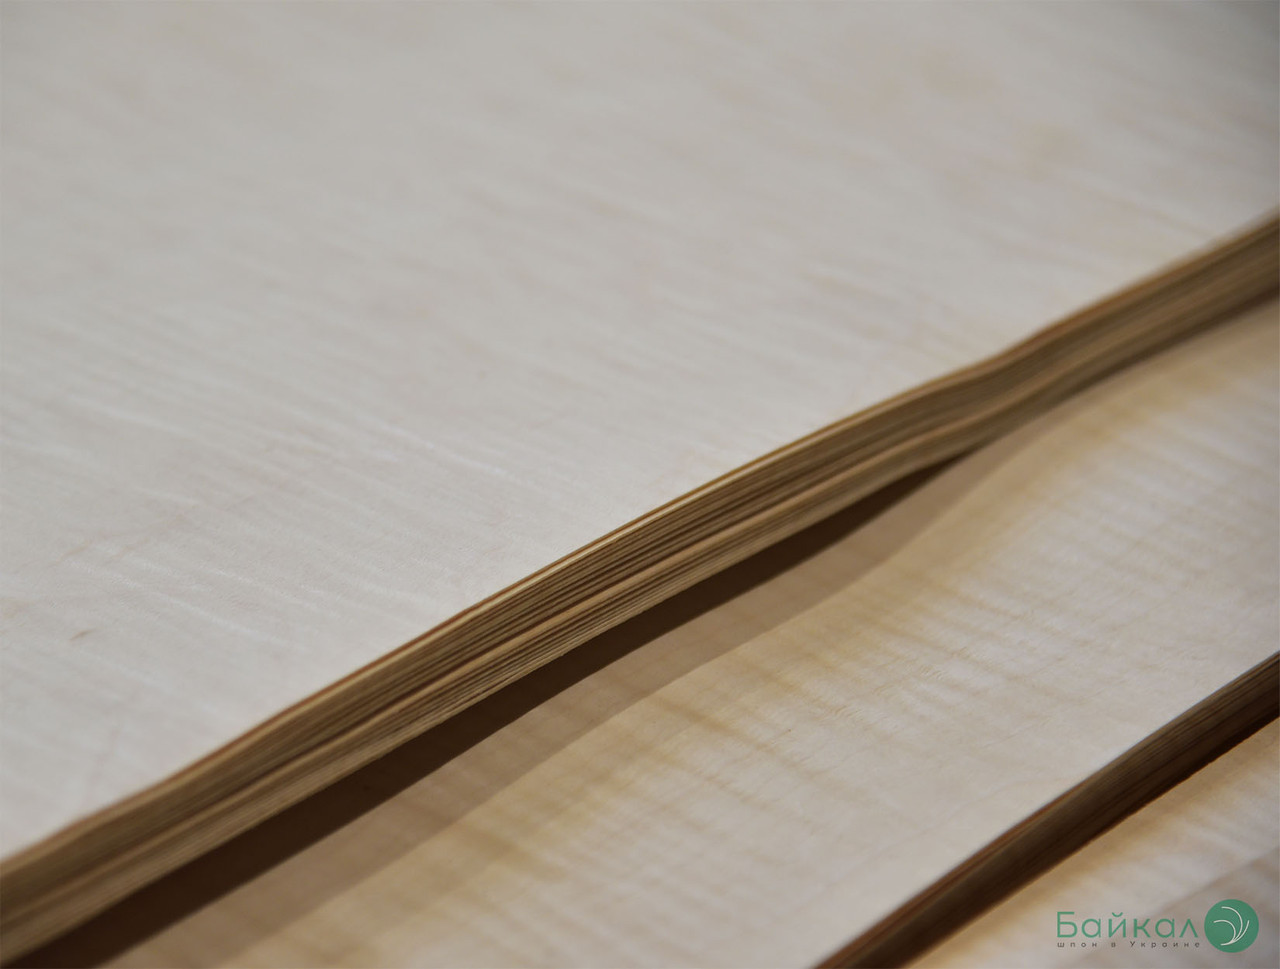 Шпон Клён Сикомора (натуральный) 0,55 мм АВ сорт - 2,10 м+/10 см+